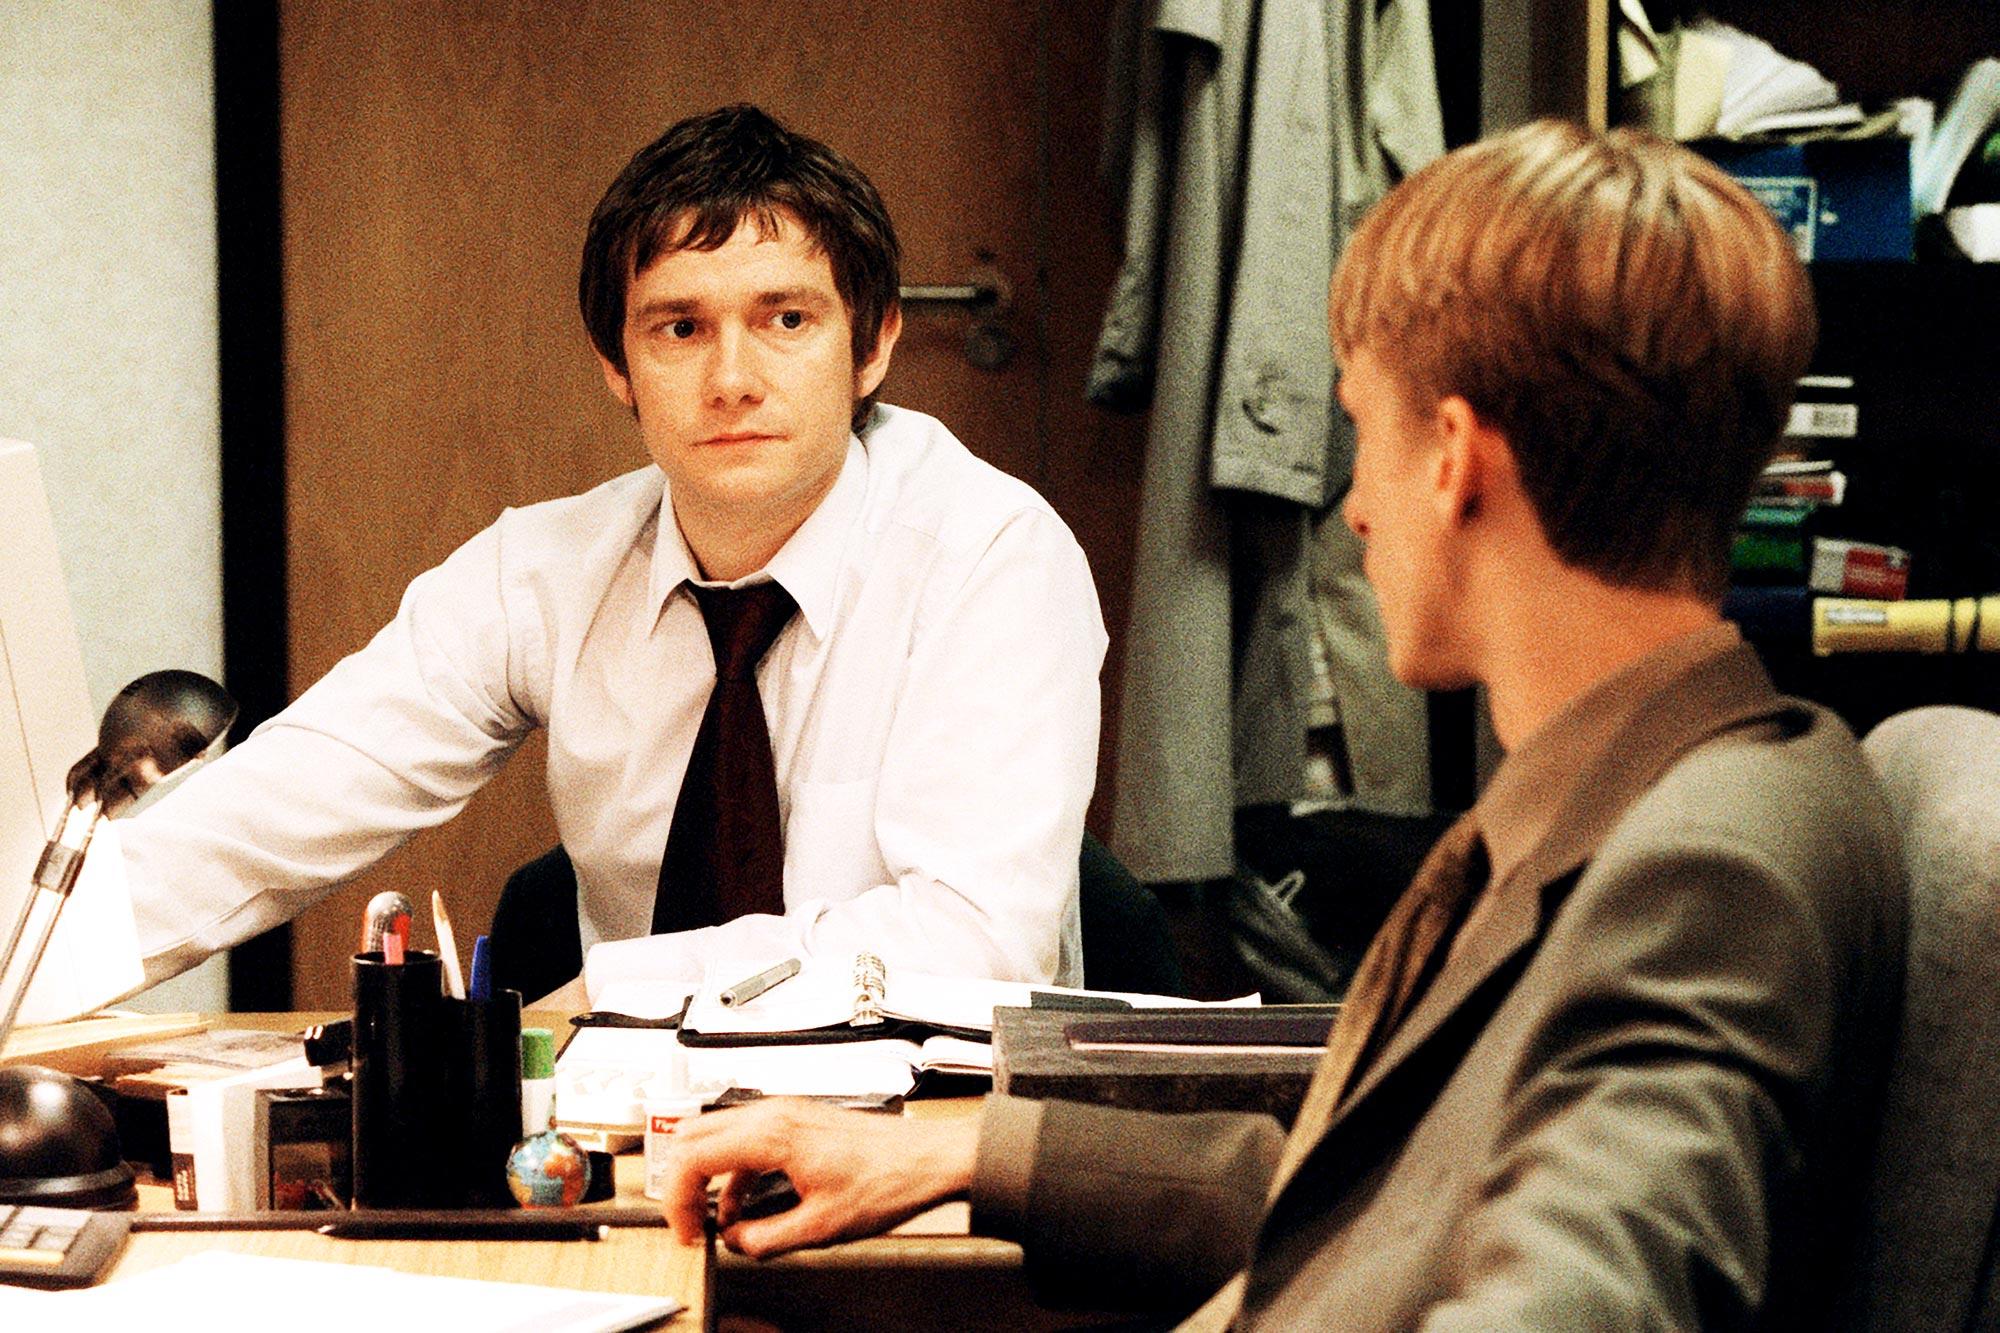 THE OFFICE, Martin Freeman, MacKenzie Crook, (Season 2), 2001-03, © BBC Ltd. / Courtesy: Everett Col